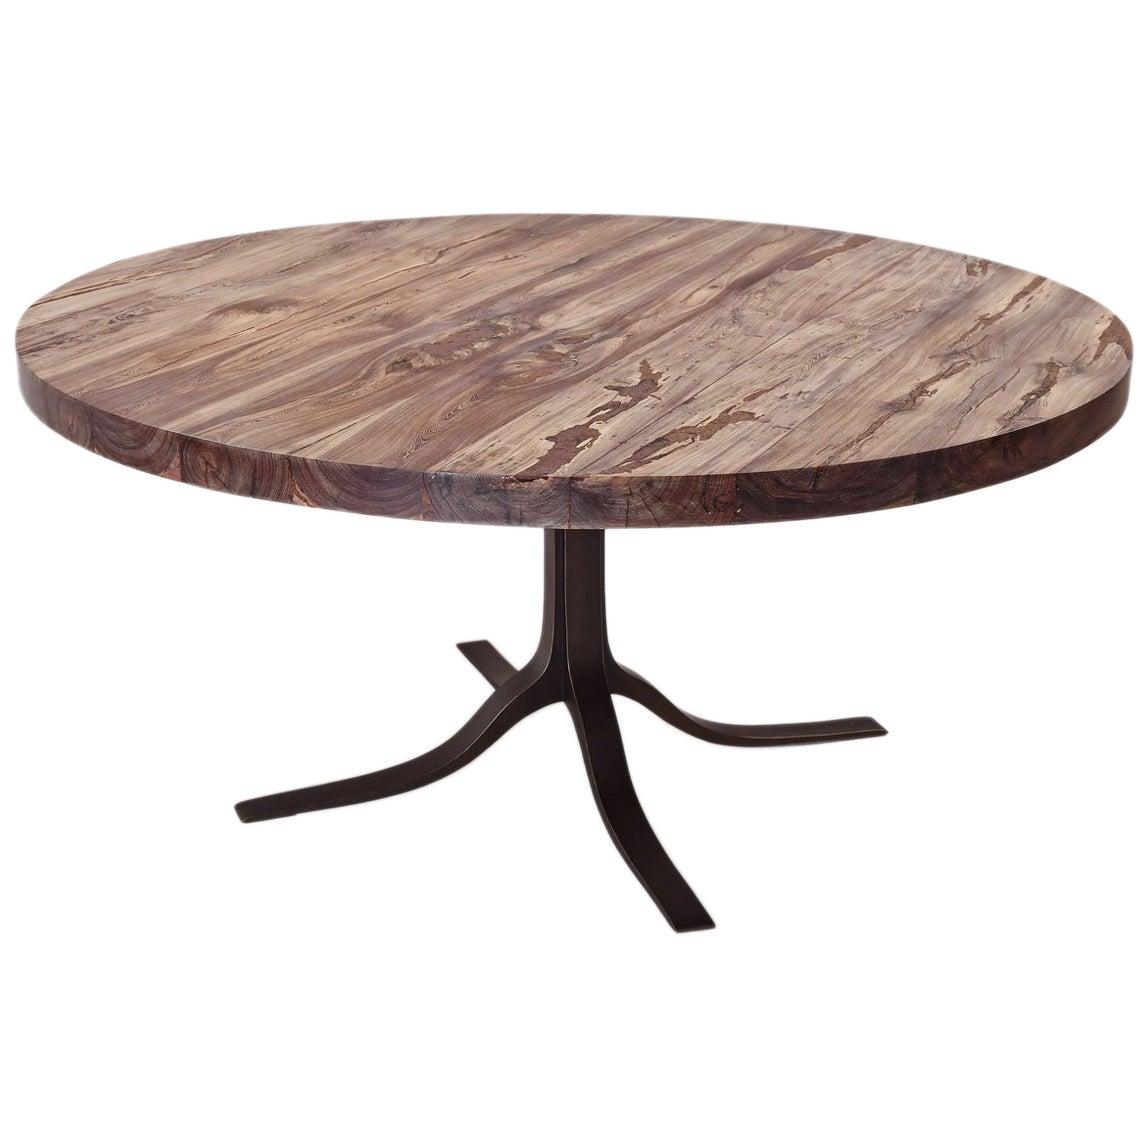 Bespoke Round Table, Reclaimed Hardwood, Brass Base by P. Tendercool